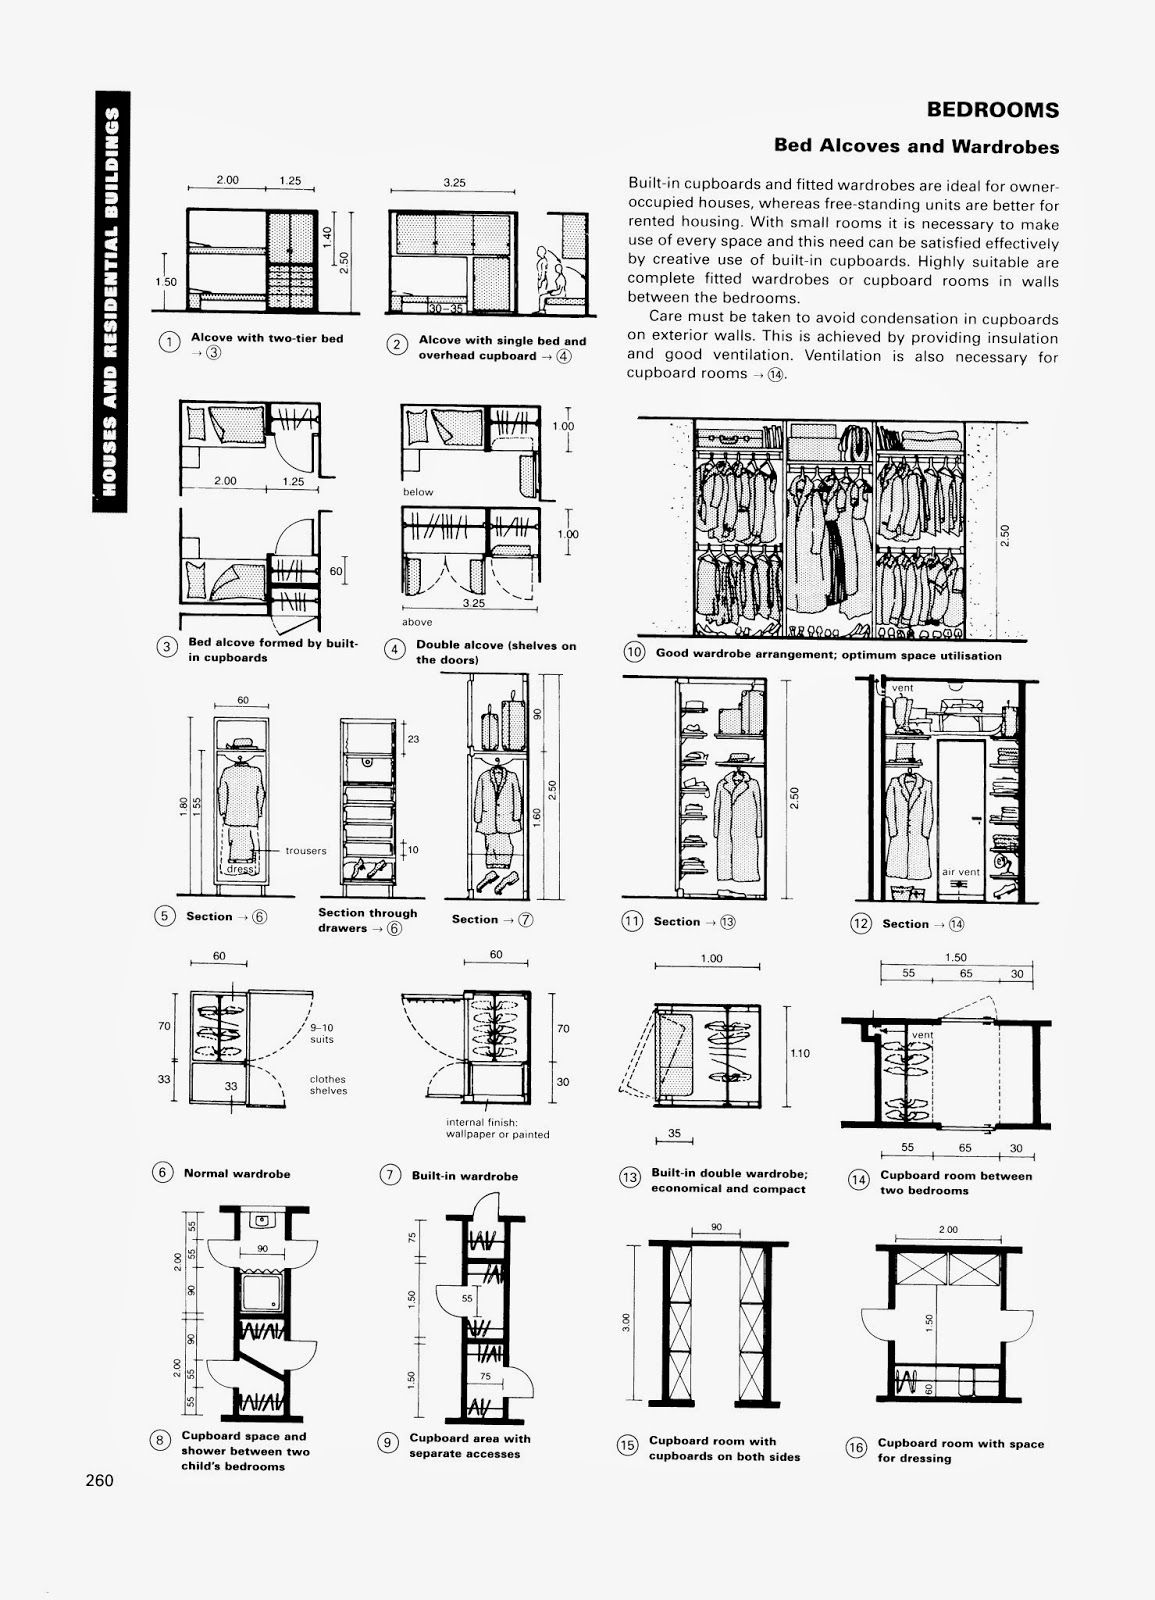 Restroom Floor Plan Wardrobe From Neufert Ernst And Peter Architects Data 3rd